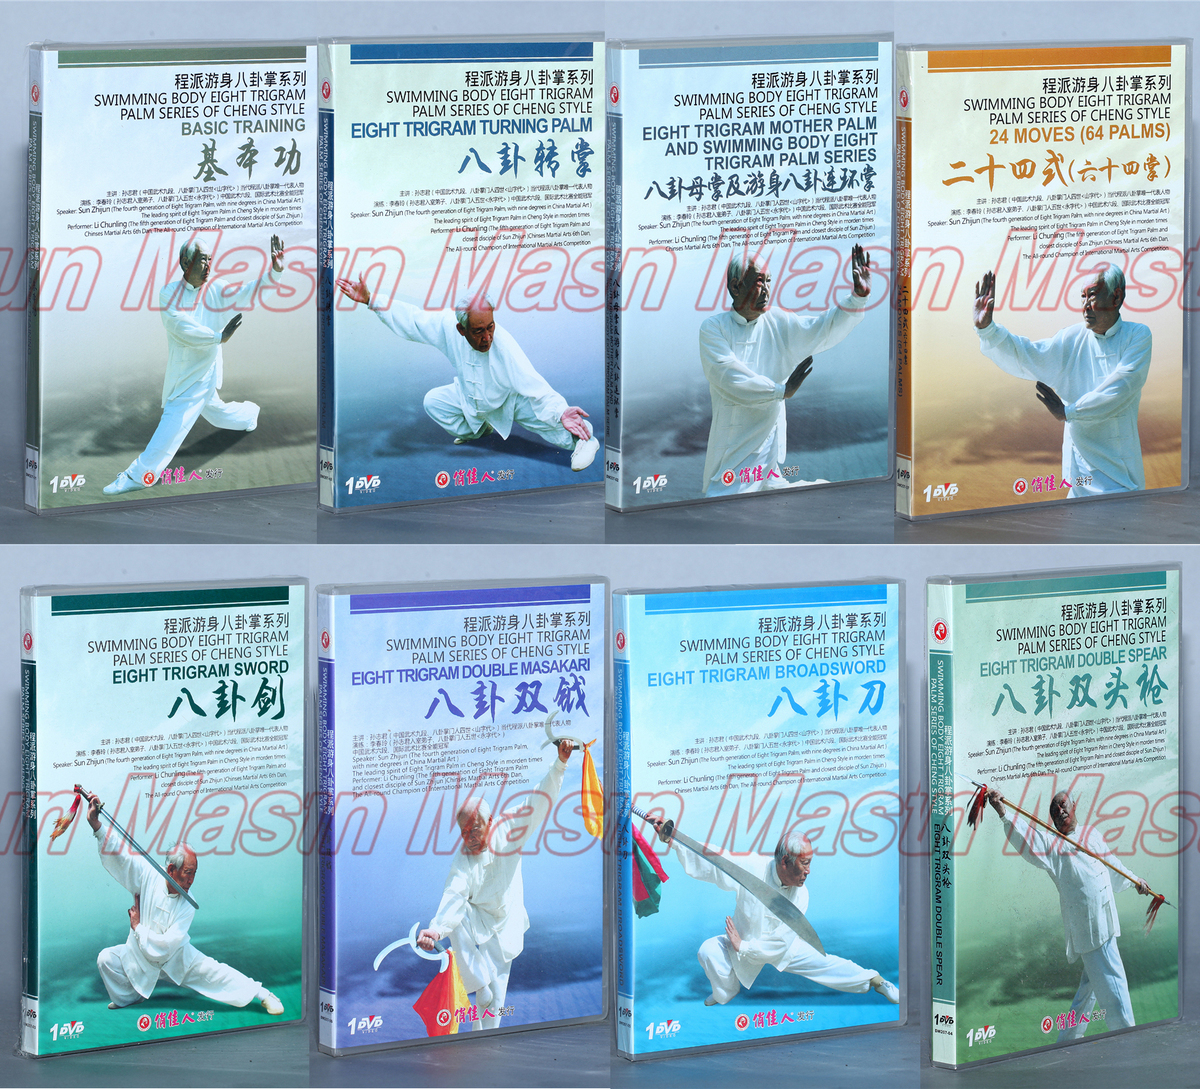 Swimming Body Eight Trigram Palm Series Of Cheng Style Chinese Kung Fu Teaching Video English Subtitles 8 DVD брюки paolo casalini цвет чёрный